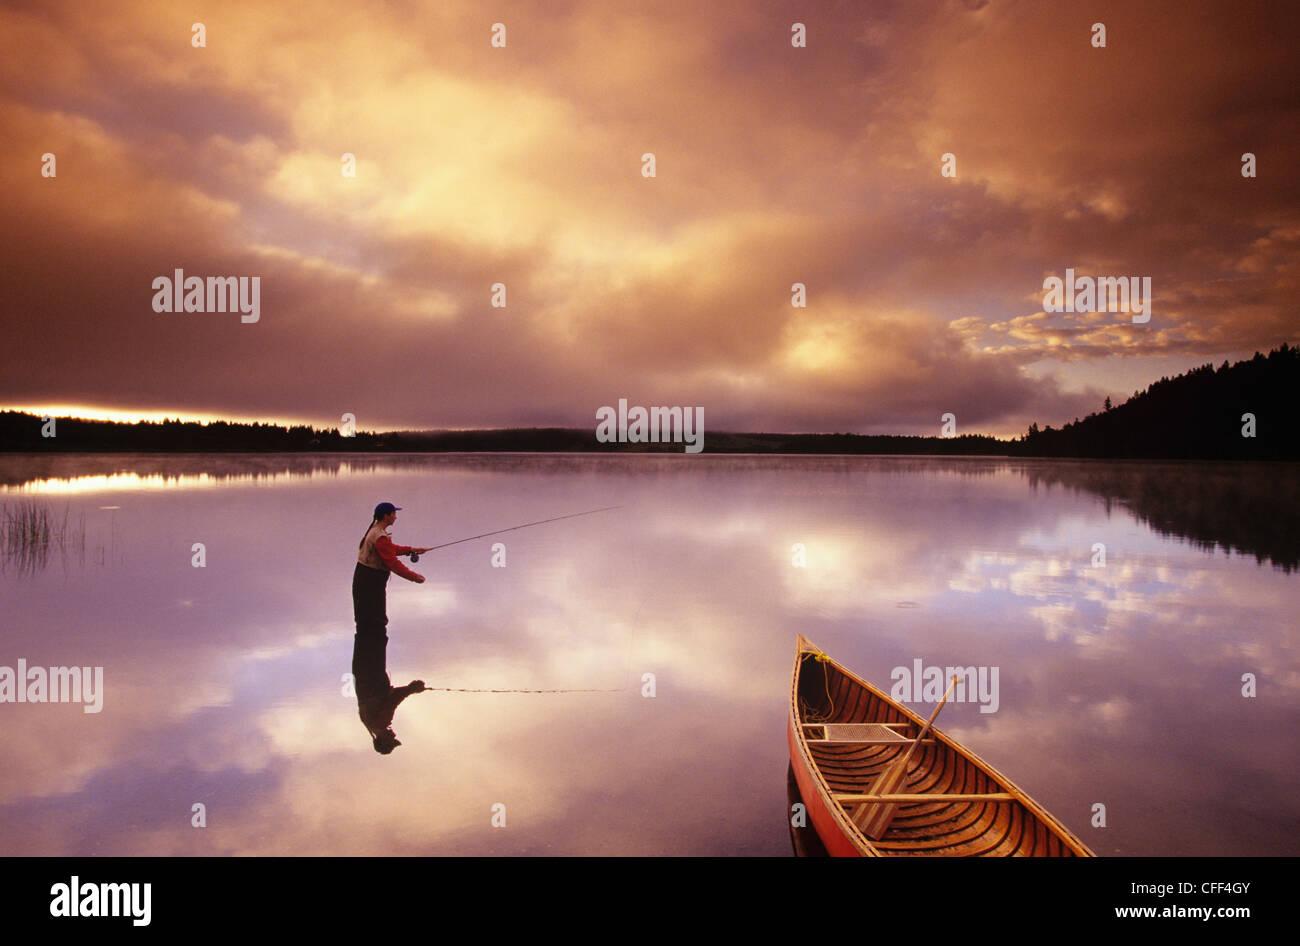 fly fishing on 108 Mile Lake, British Columbia, Canada. Stock Photo